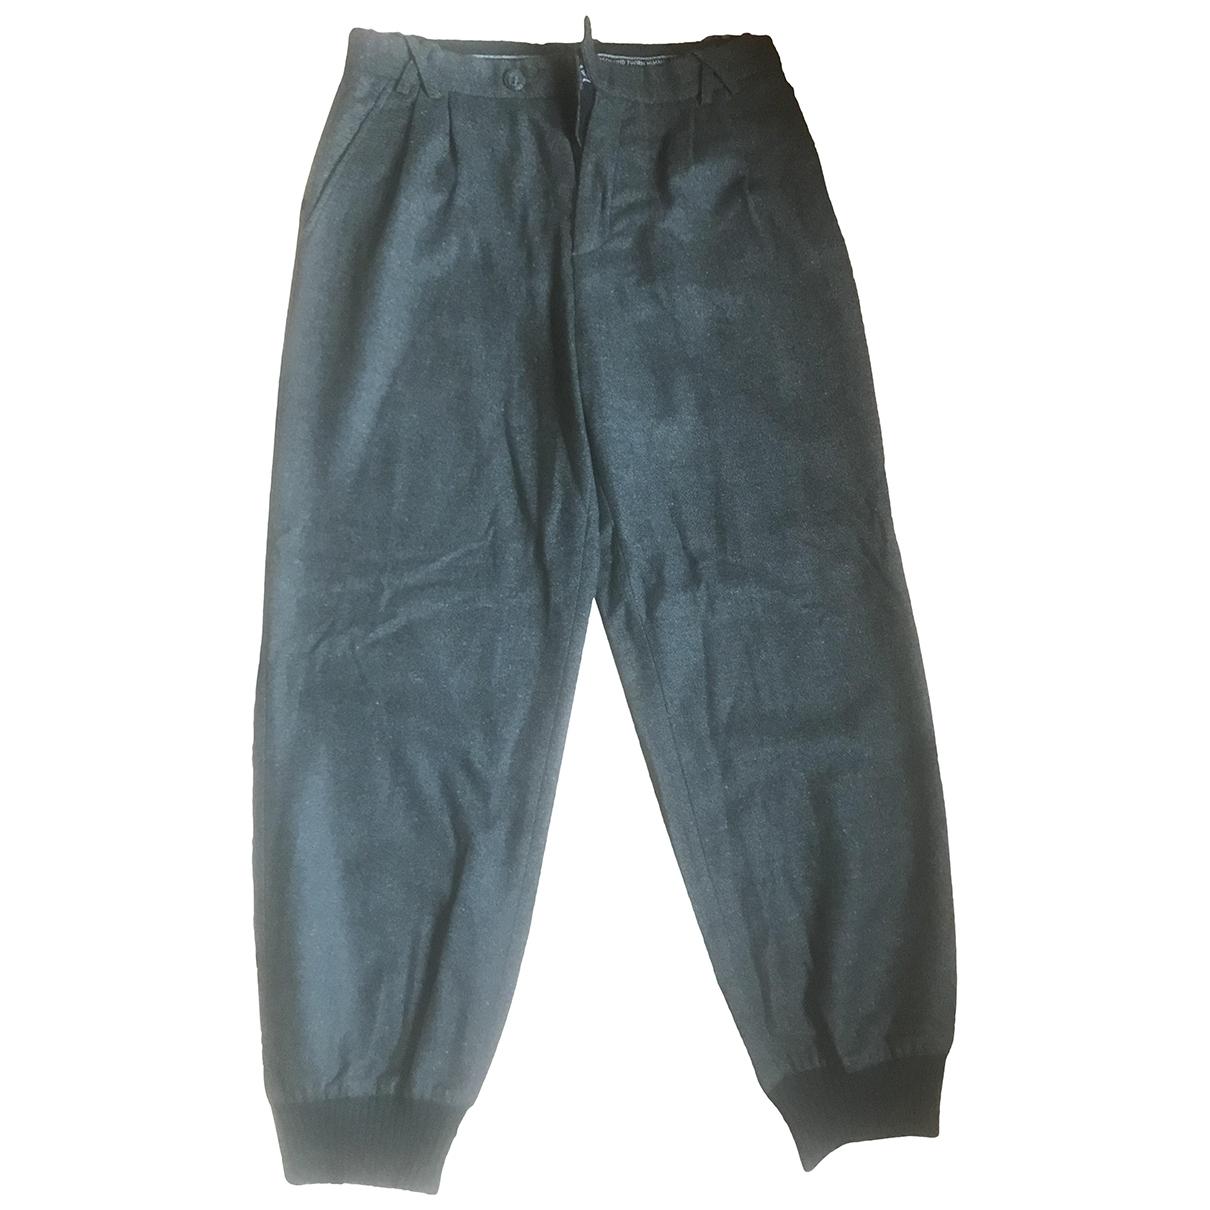 Bernhard Willhelm \N Anthracite Wool Trousers for Men 50 IT